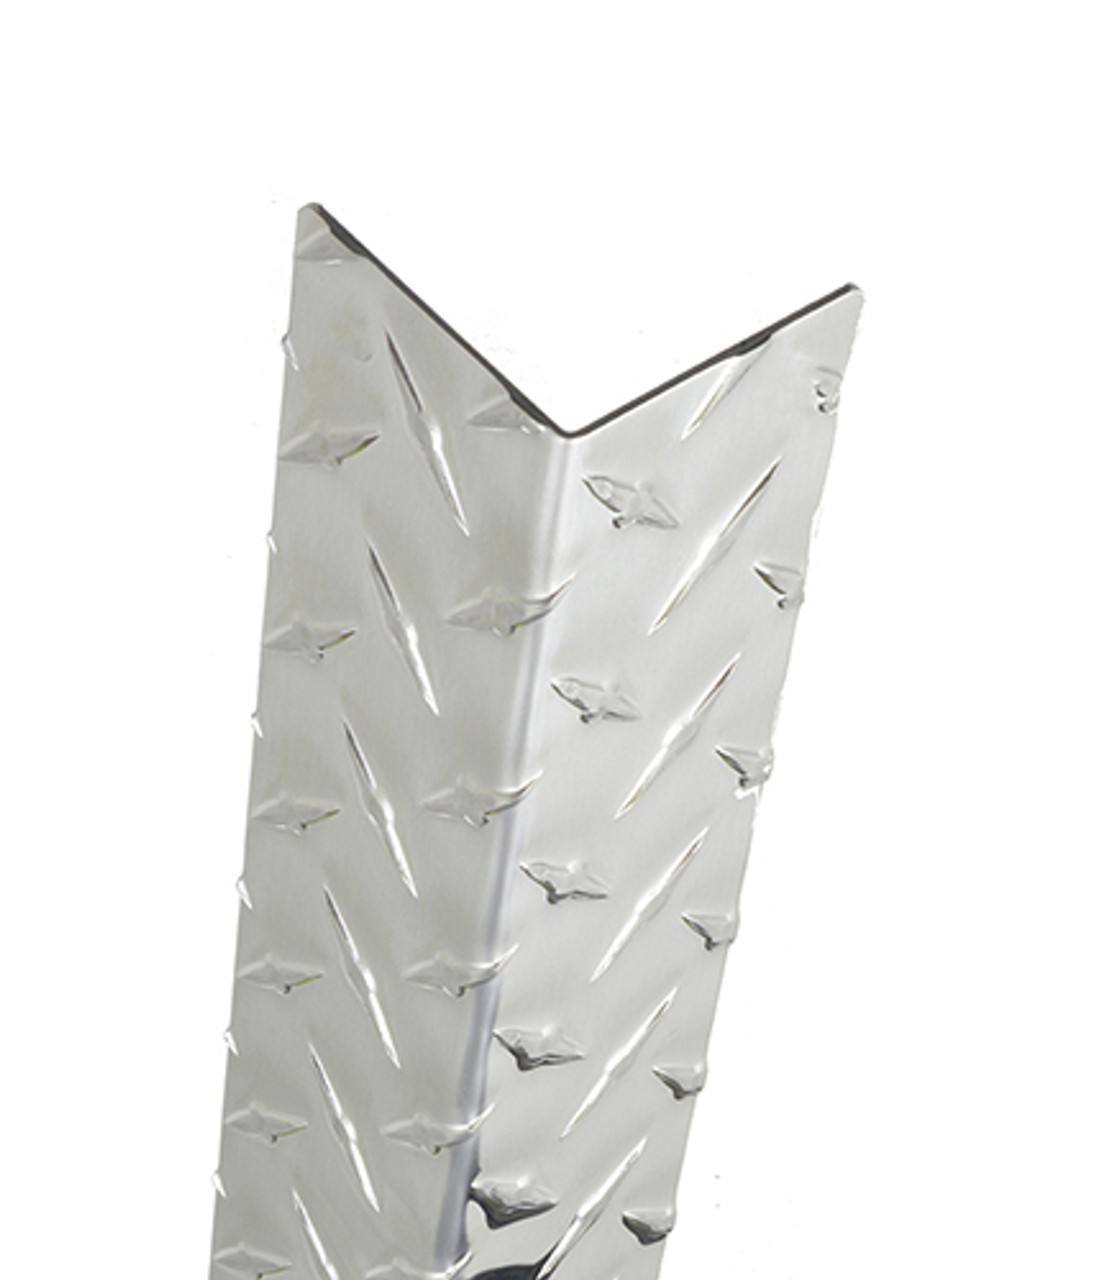 60in X 2in 063 Aluminum Diamond Plate Corner Guard